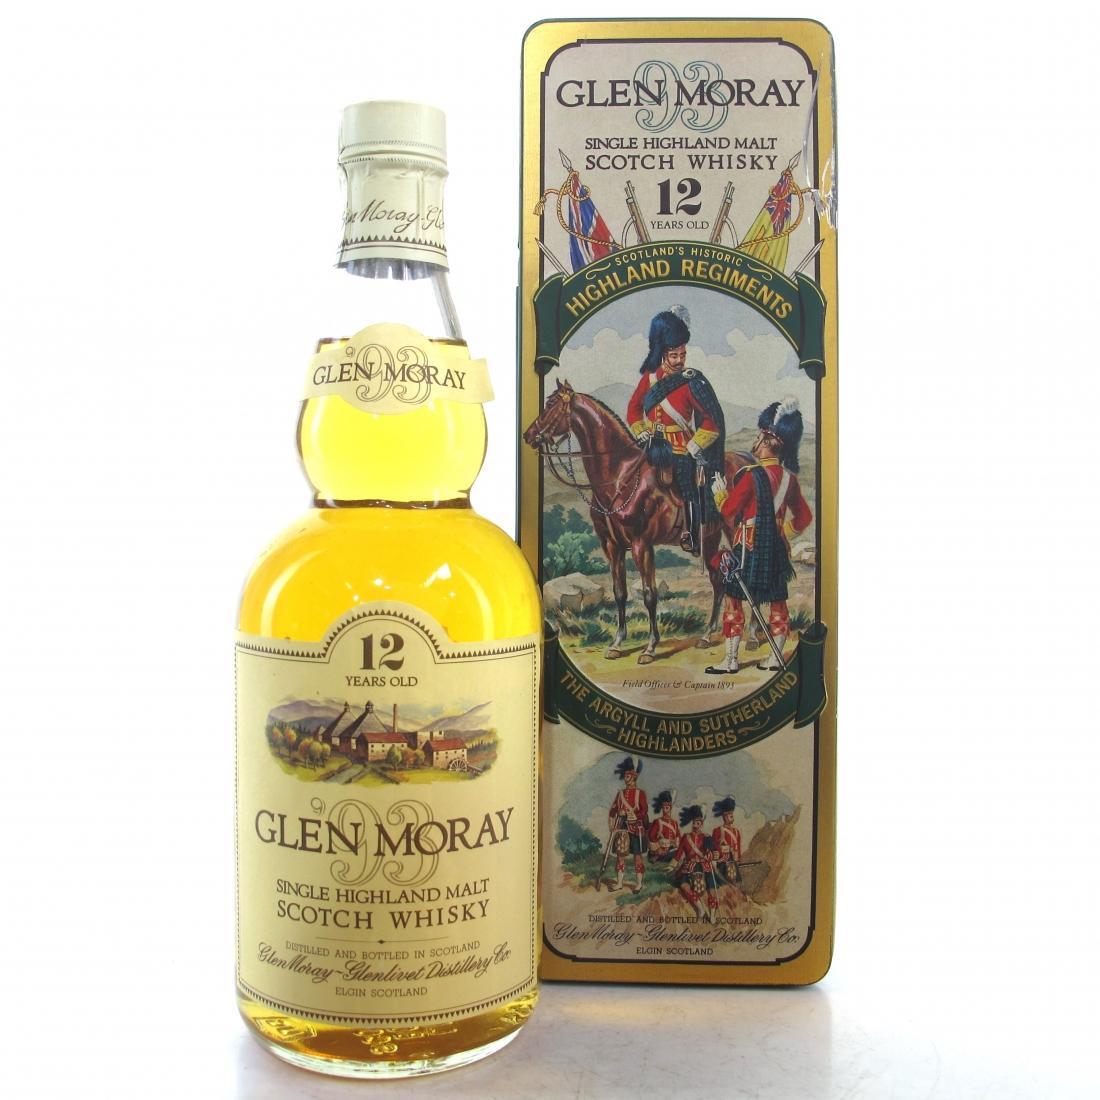 Glen Moray 12 Year Old 1980s / Argyll and Sutherland Highlanders